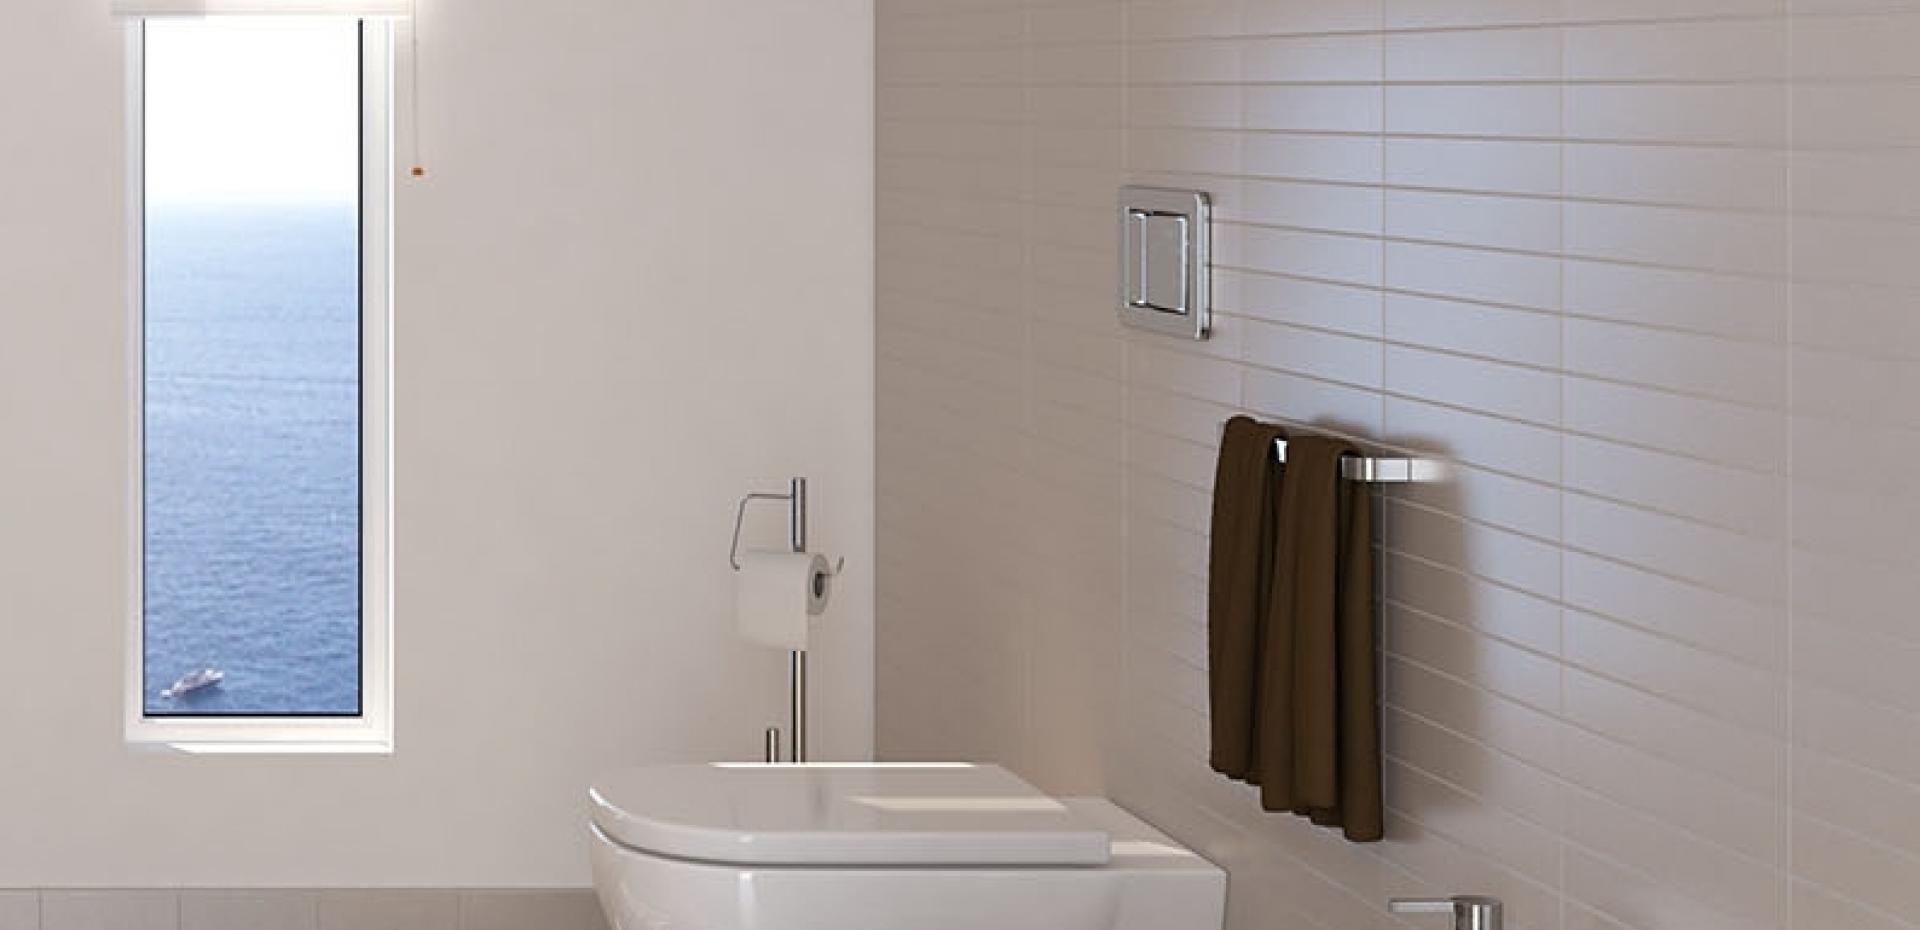 Piastrelle interni vogue system piastrelle per bagno e cucina - Rivestimento cucina no piastrelle ...